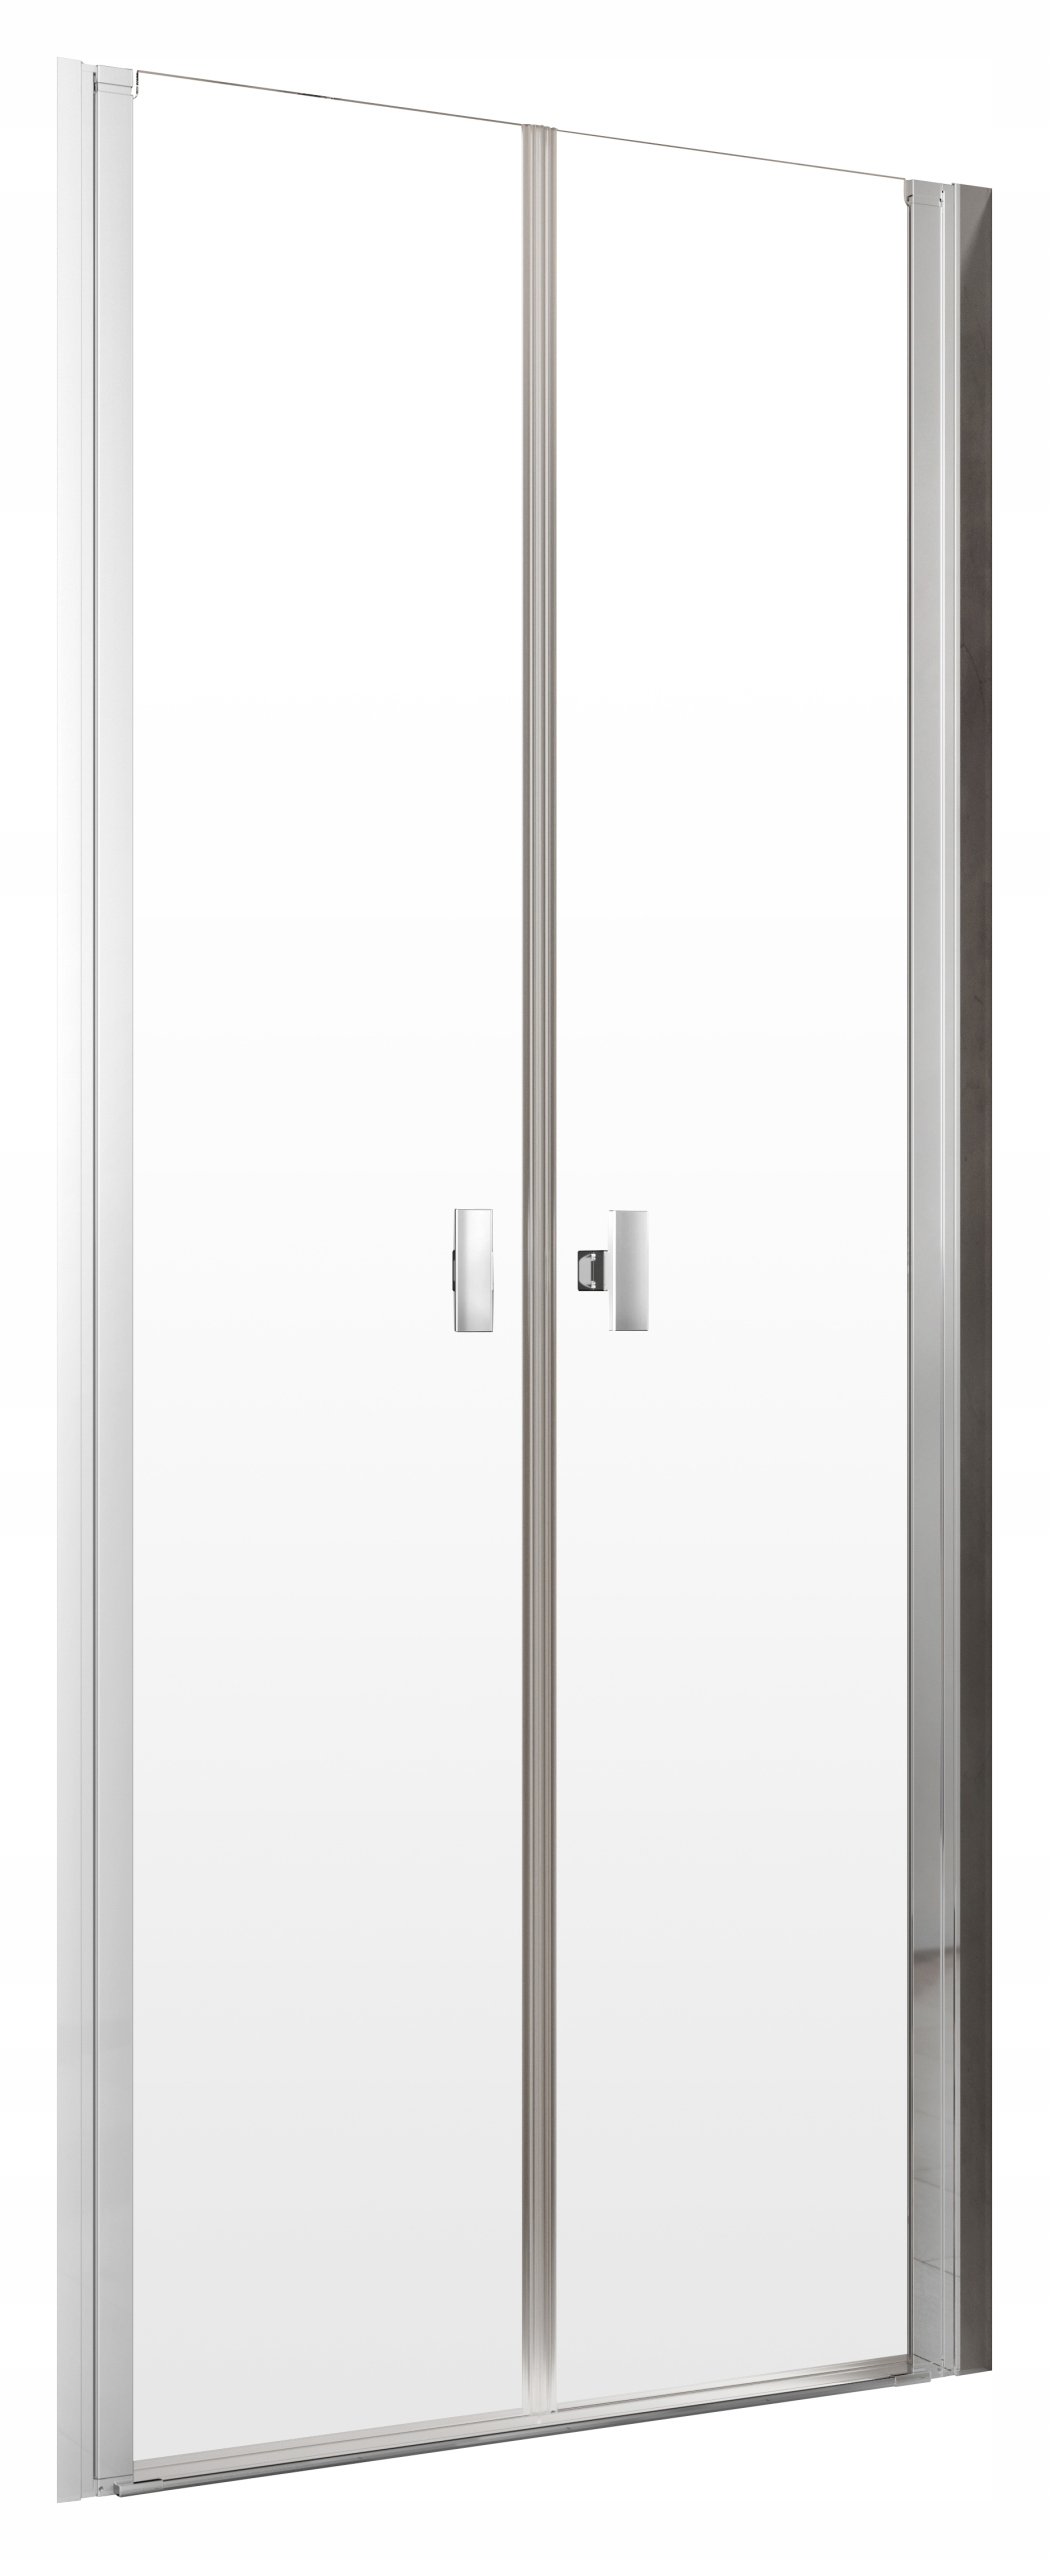 Nes 8 DWD I 80x200 RADAWAY CHROM sprchové dvere